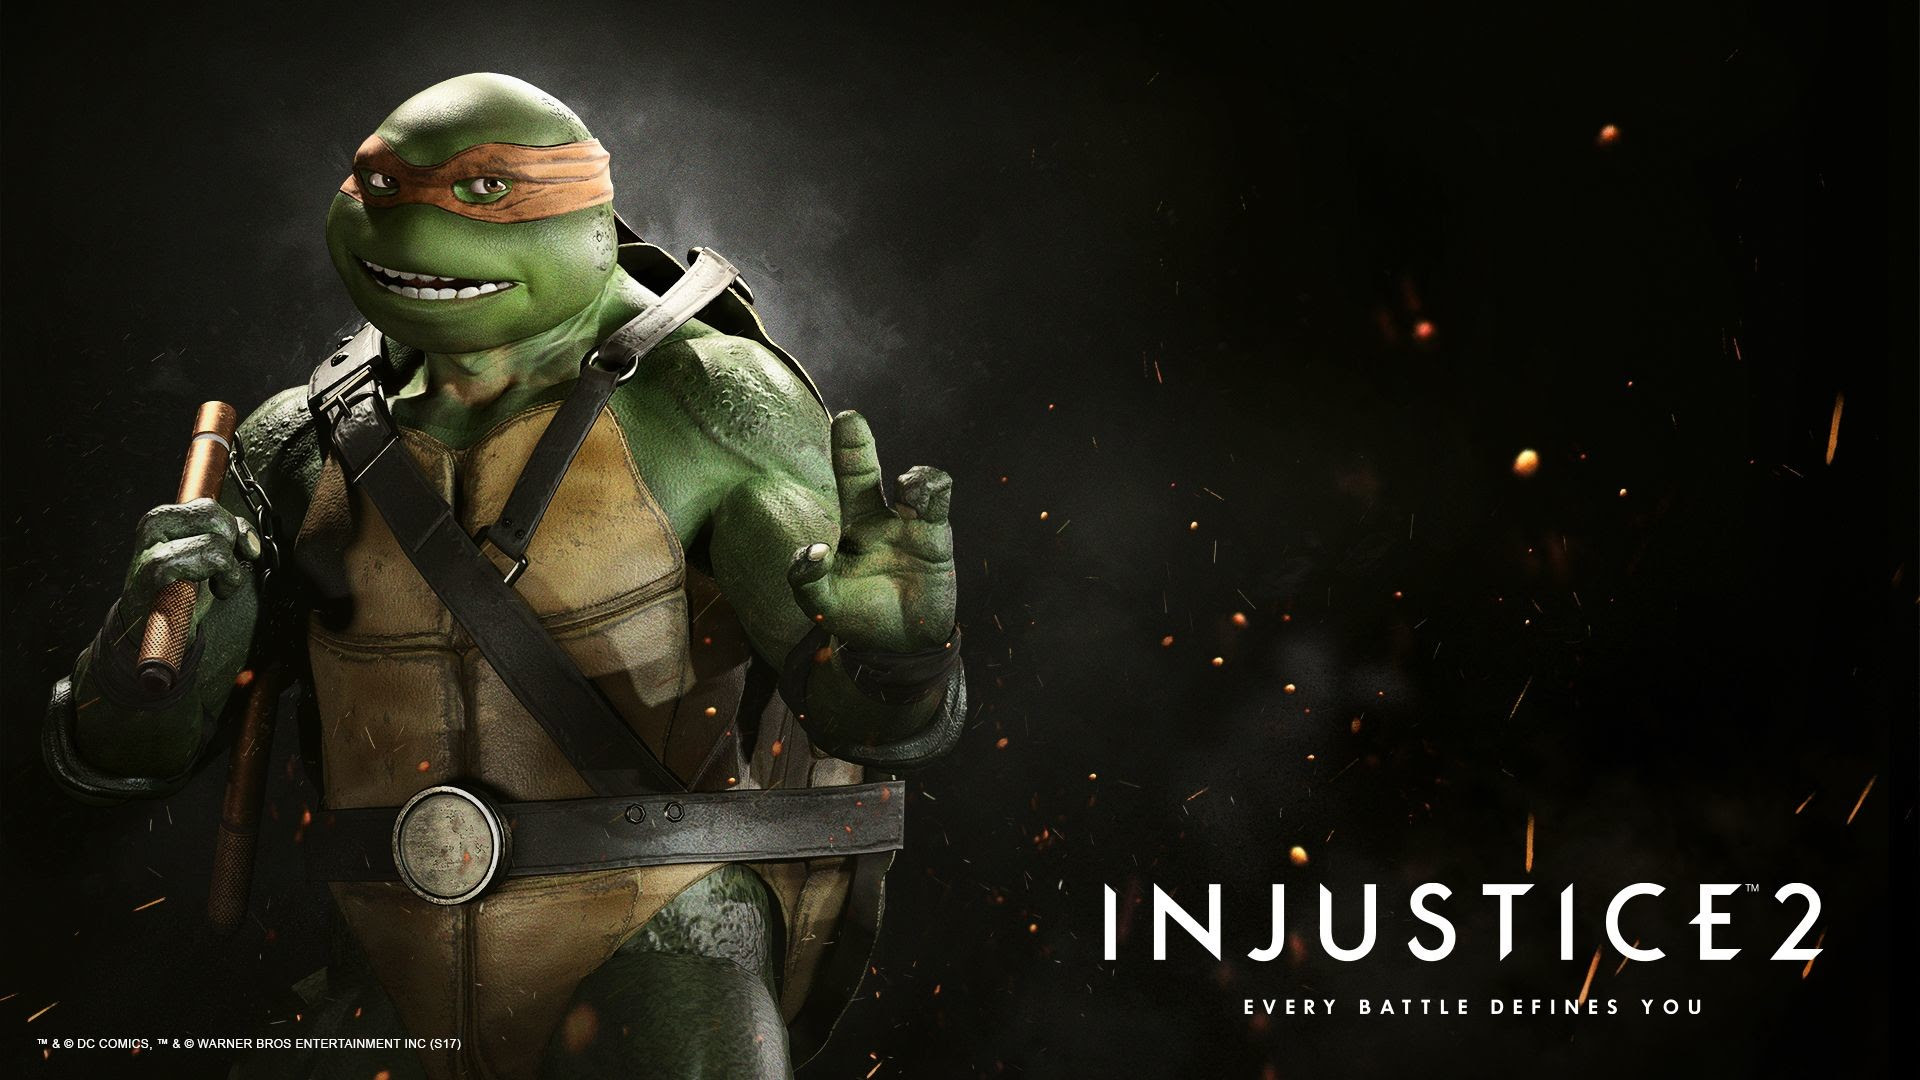 Ninja Turtle Iphone Wallpaper 75 Images